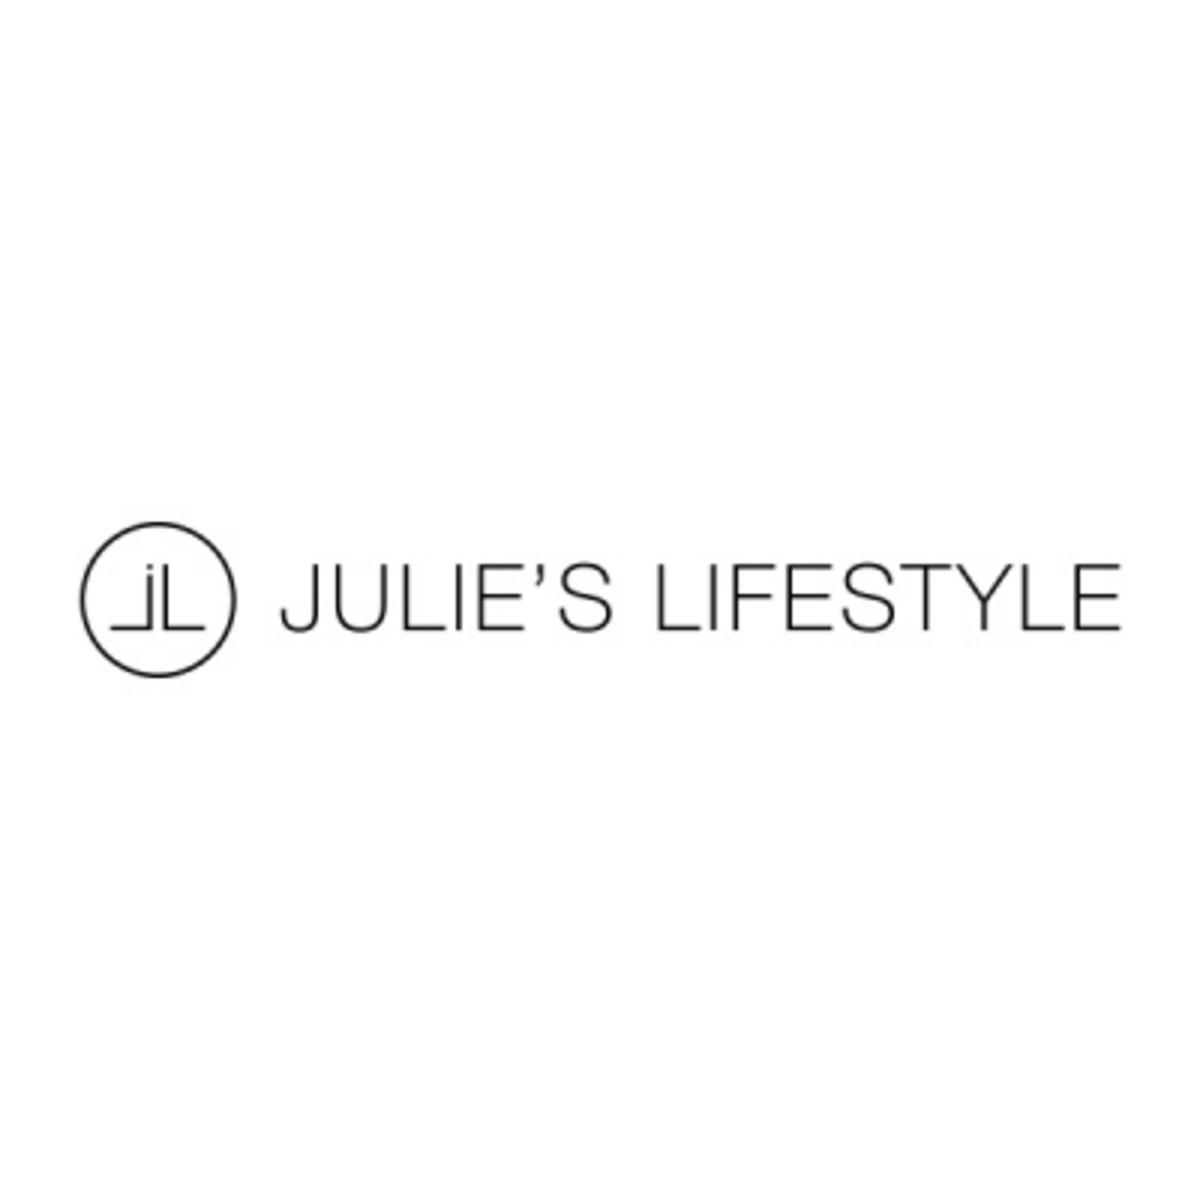 Julie's Lifestyle